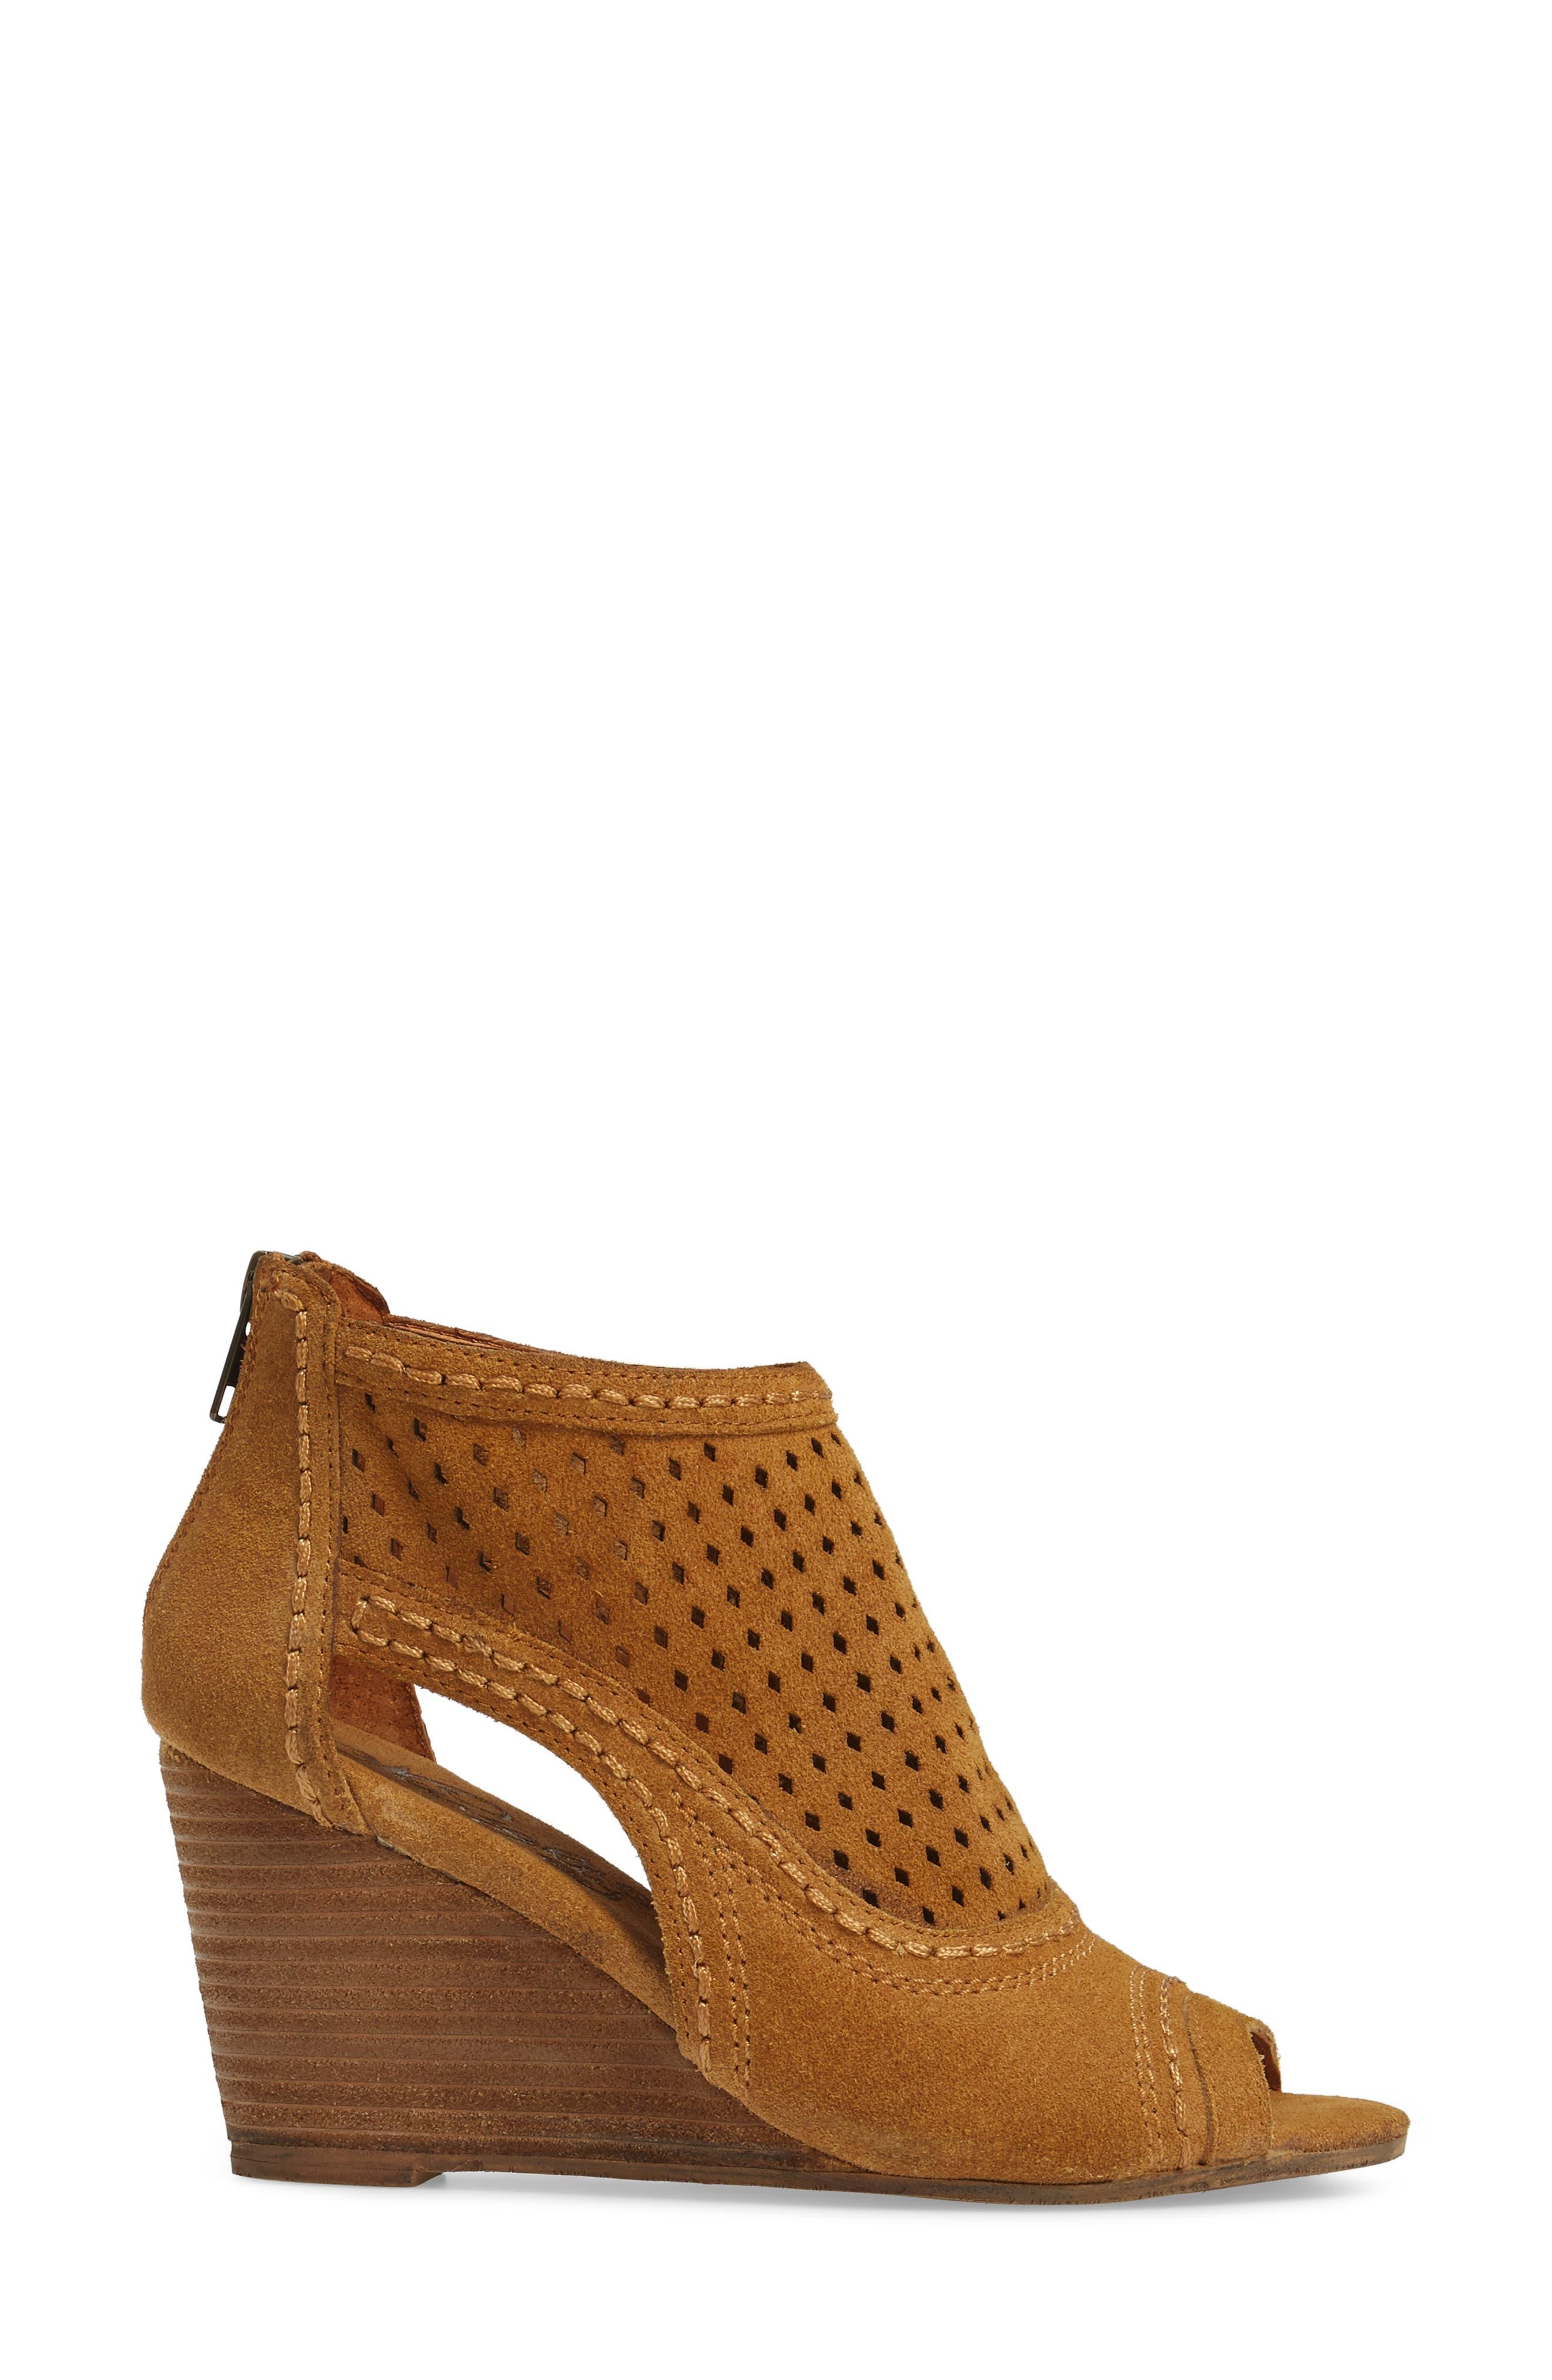 Sharon Perforated Wedge Sandal,                             Alternate thumbnail 5, color,